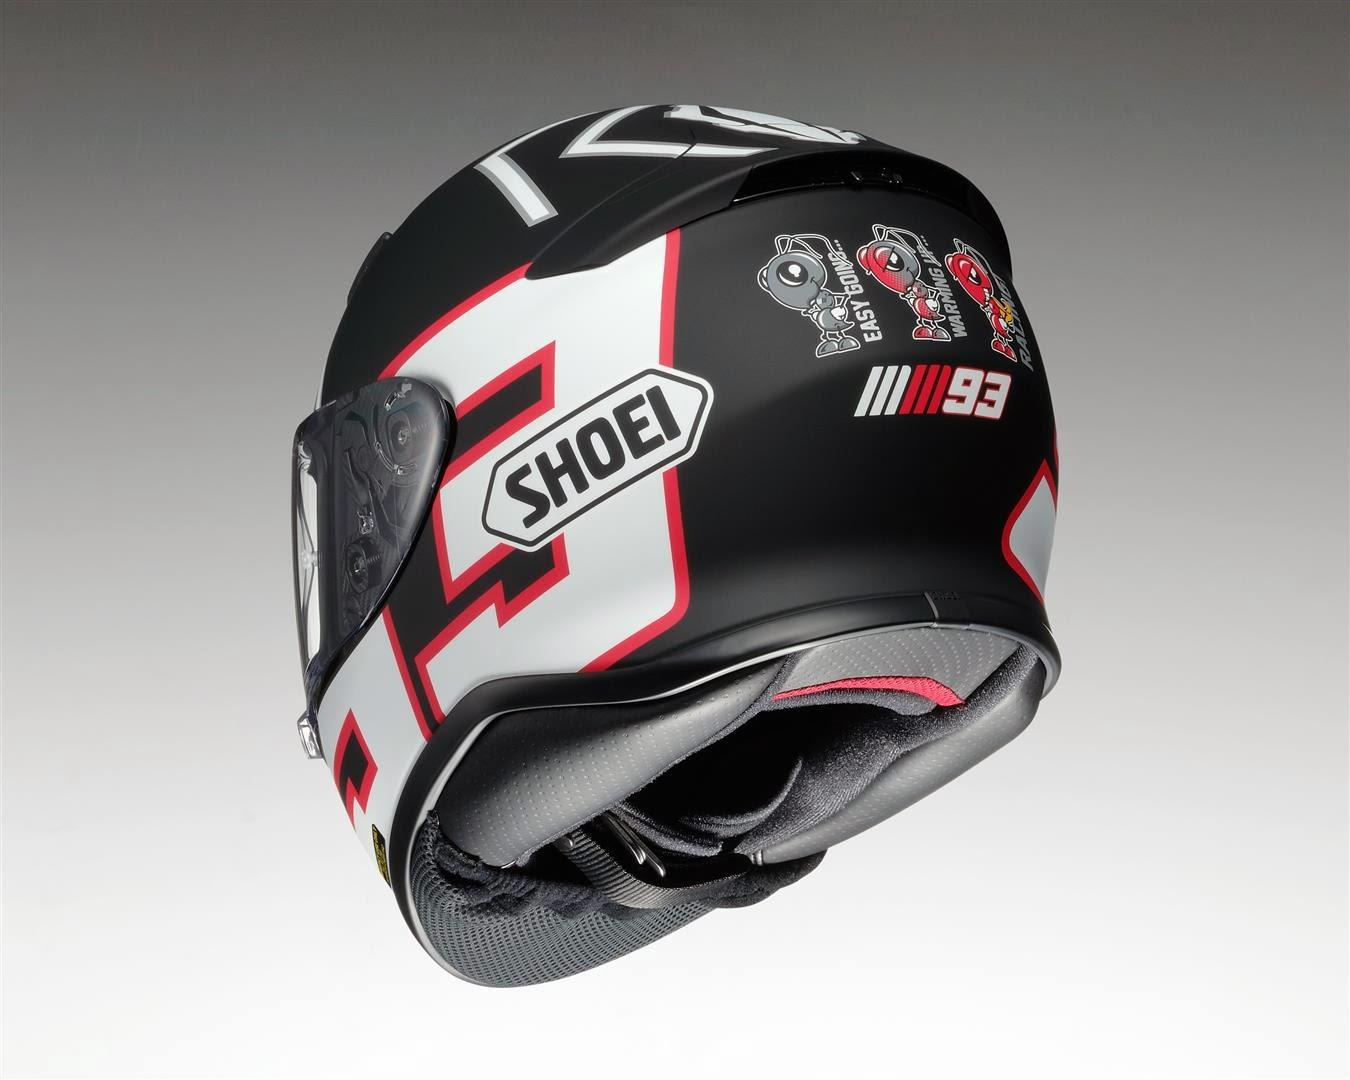 racing helmets garage shoei nxr replica marquez test valencia 2012 2014. Black Bedroom Furniture Sets. Home Design Ideas